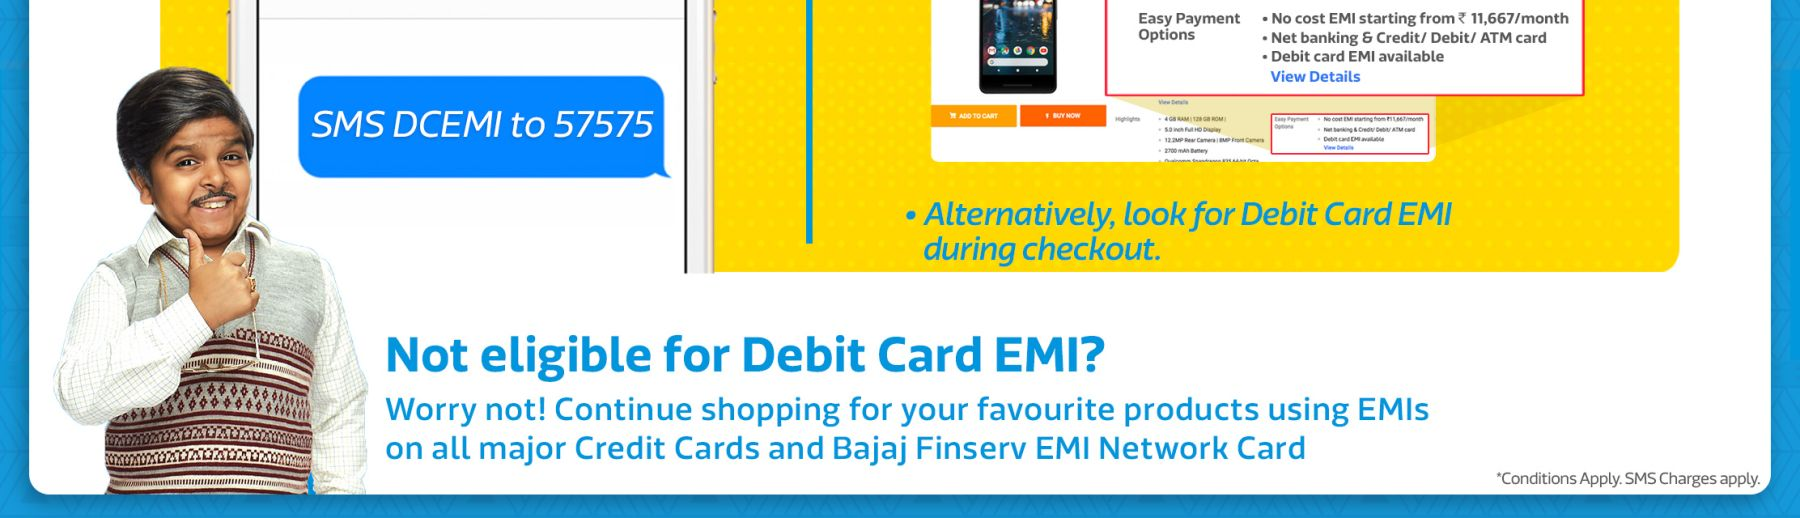 EMI on Debit Cards | Easy Installments on Debit Cards at Flipkart com